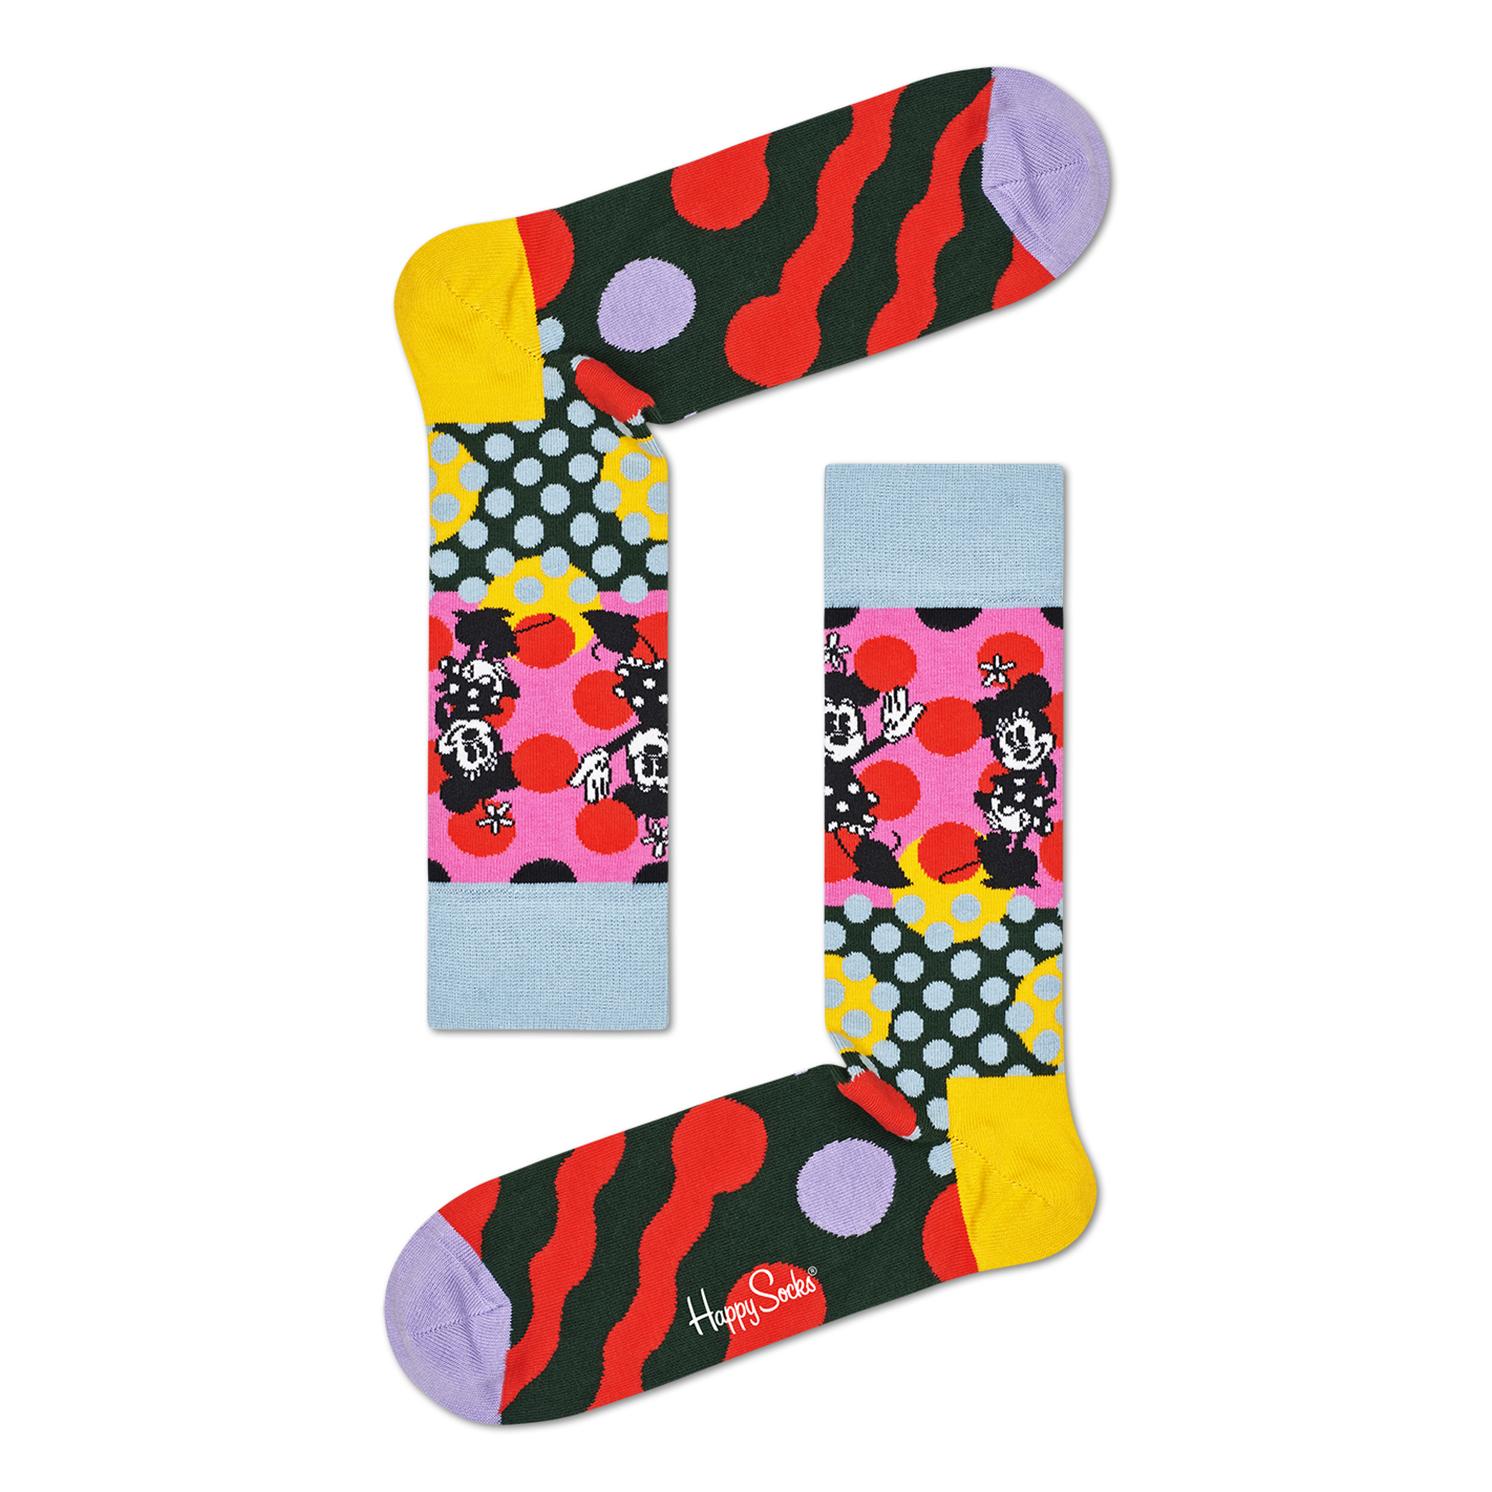 Happy Socks – Set of 4 Pairs of Disney Socks in Presentation Gift Box